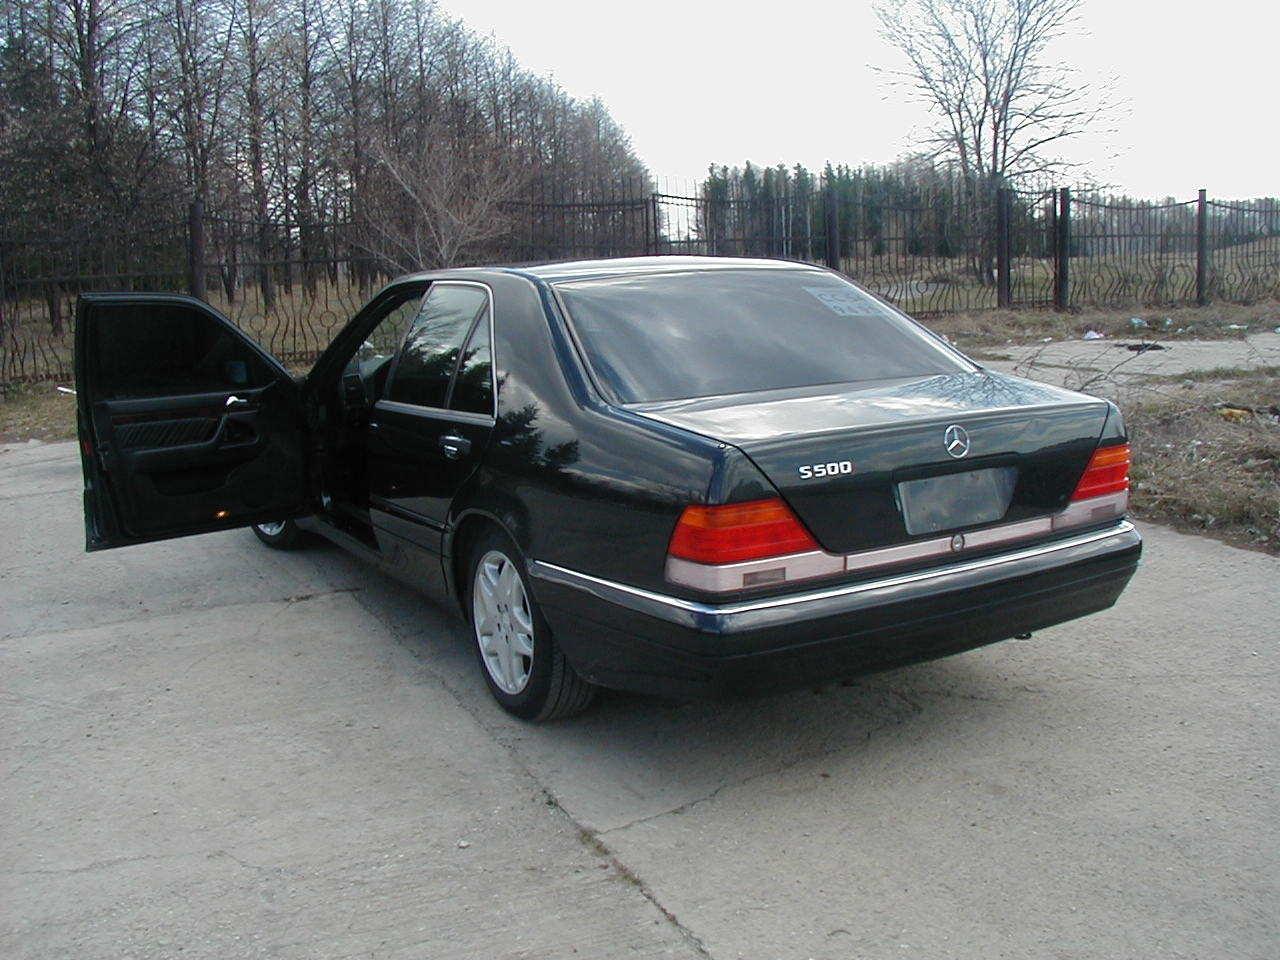 1995 mercedes benz s class pictures gasoline fr for 1995 mercedes benz s class